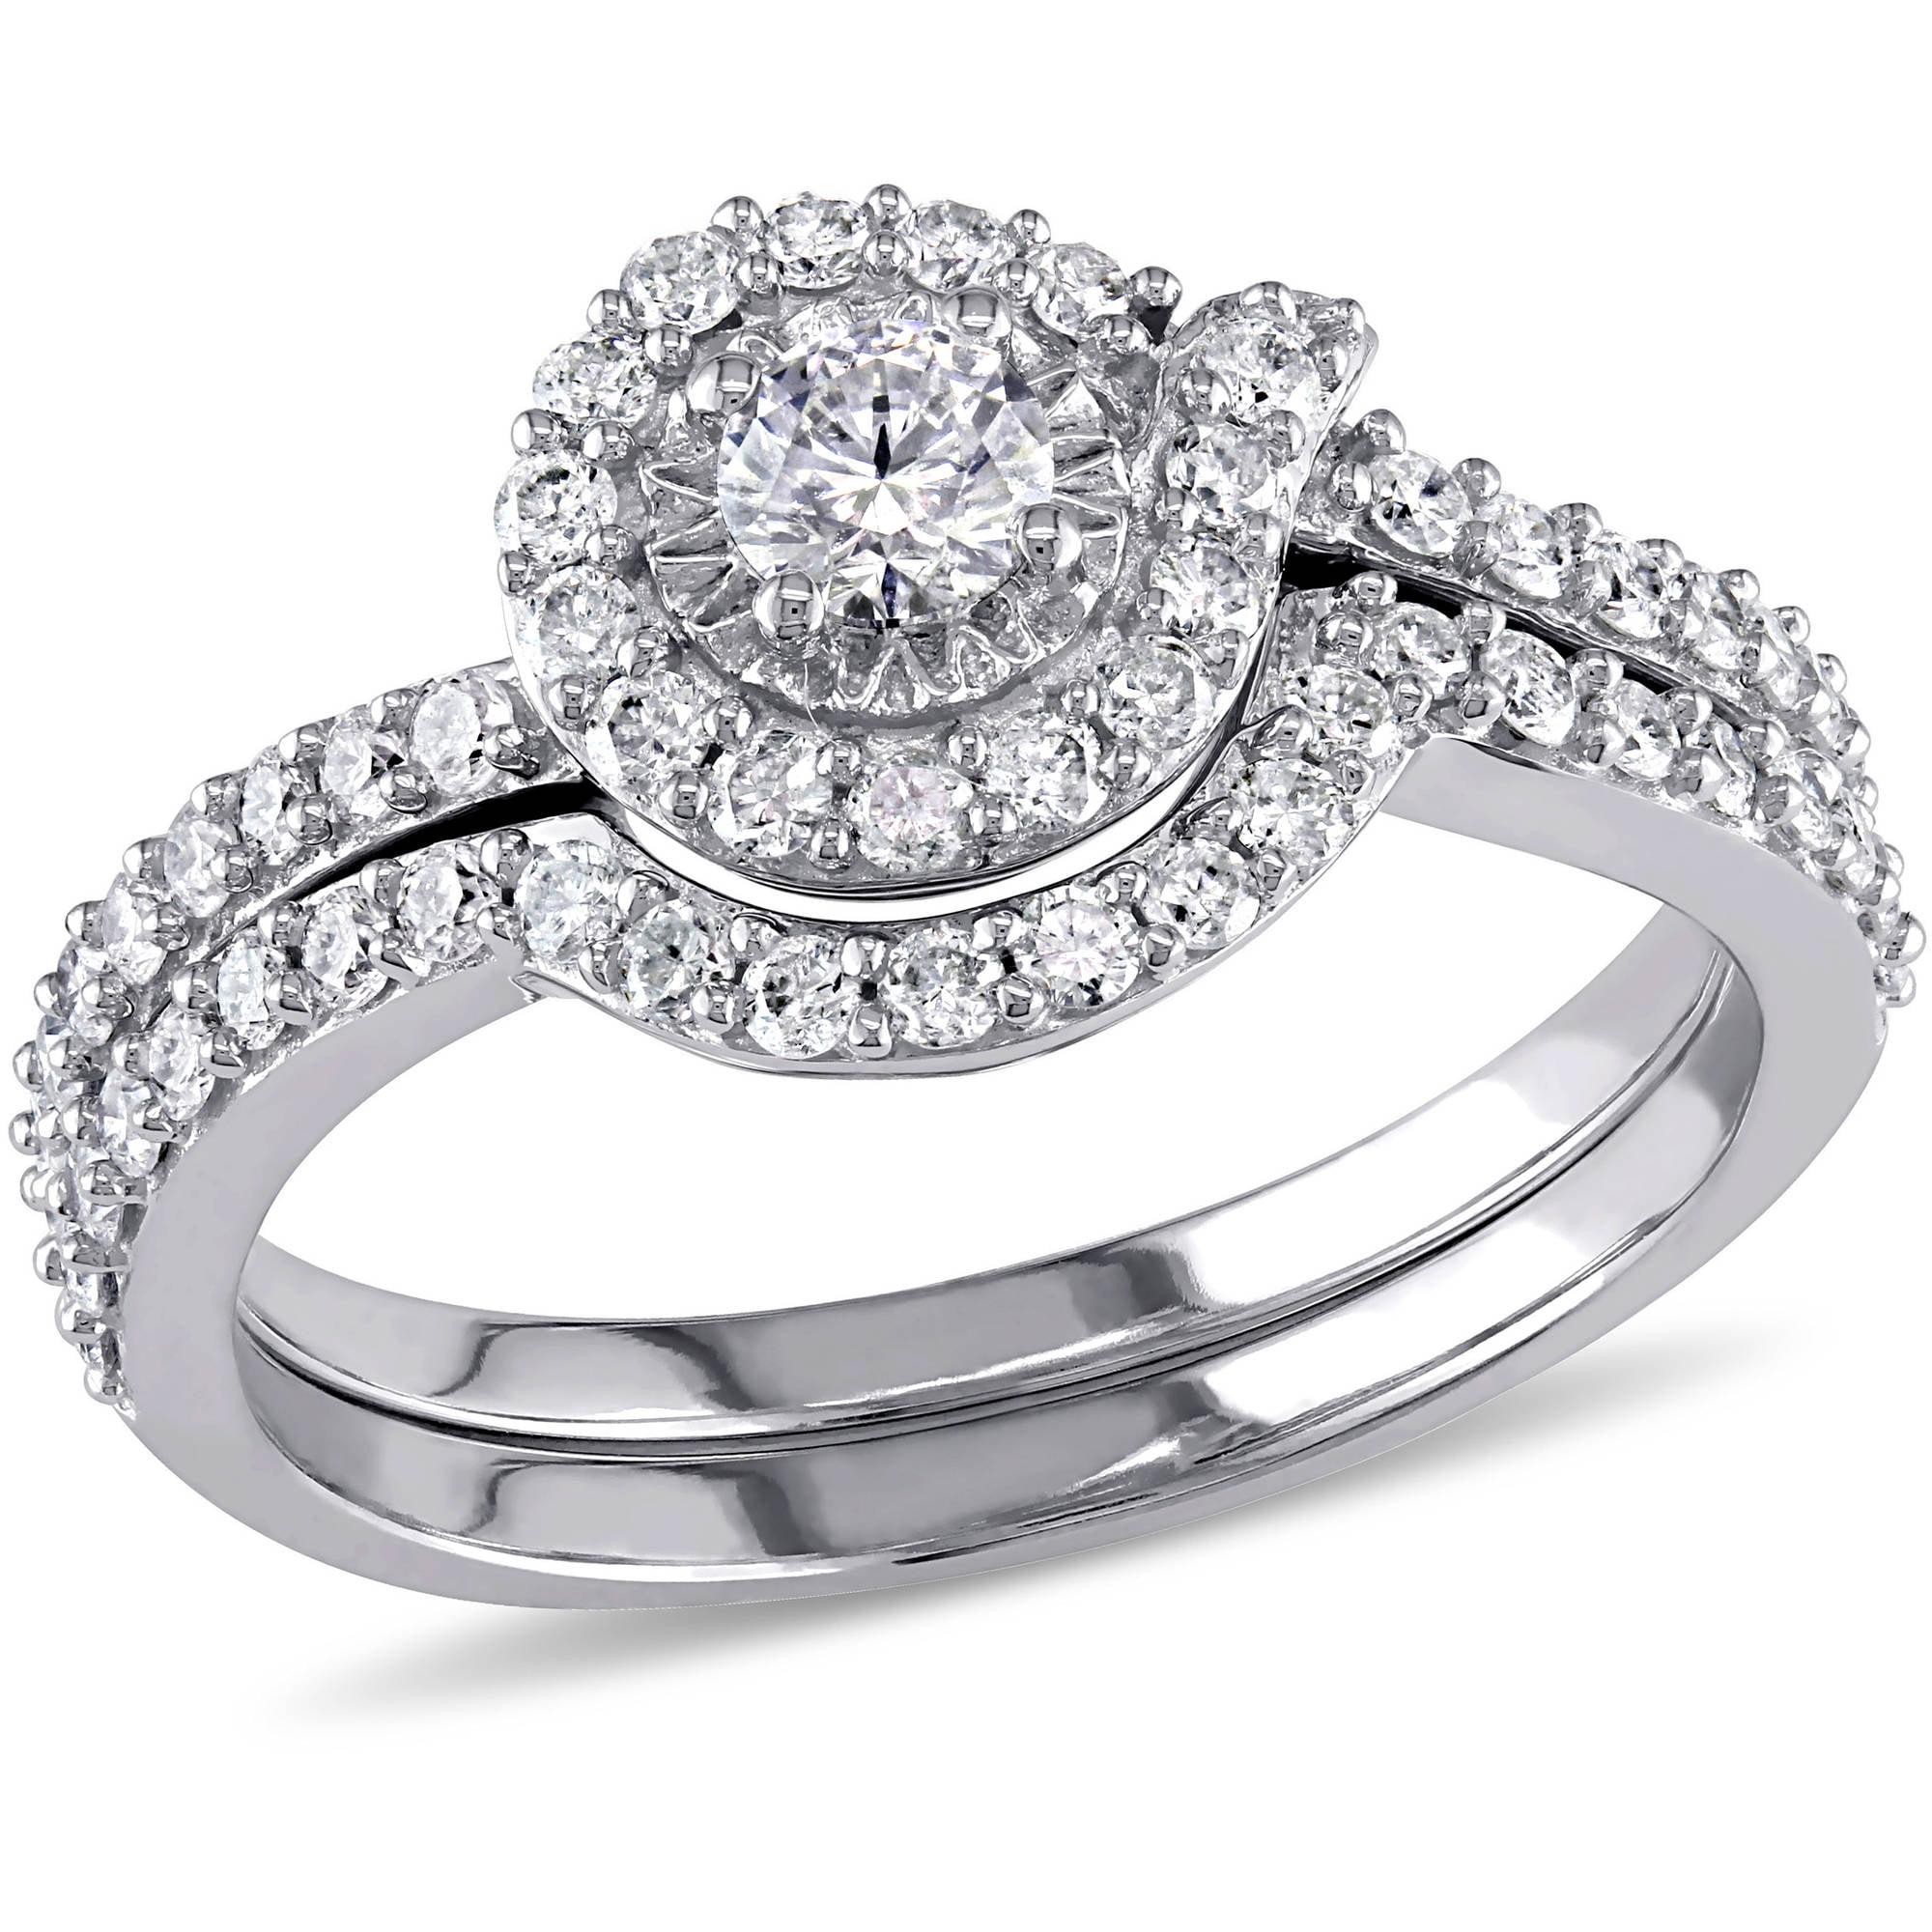 Miabella 3 4 Carat T.G.W. Diamond 10kt White Gold Halo Bridal Set by Miabella